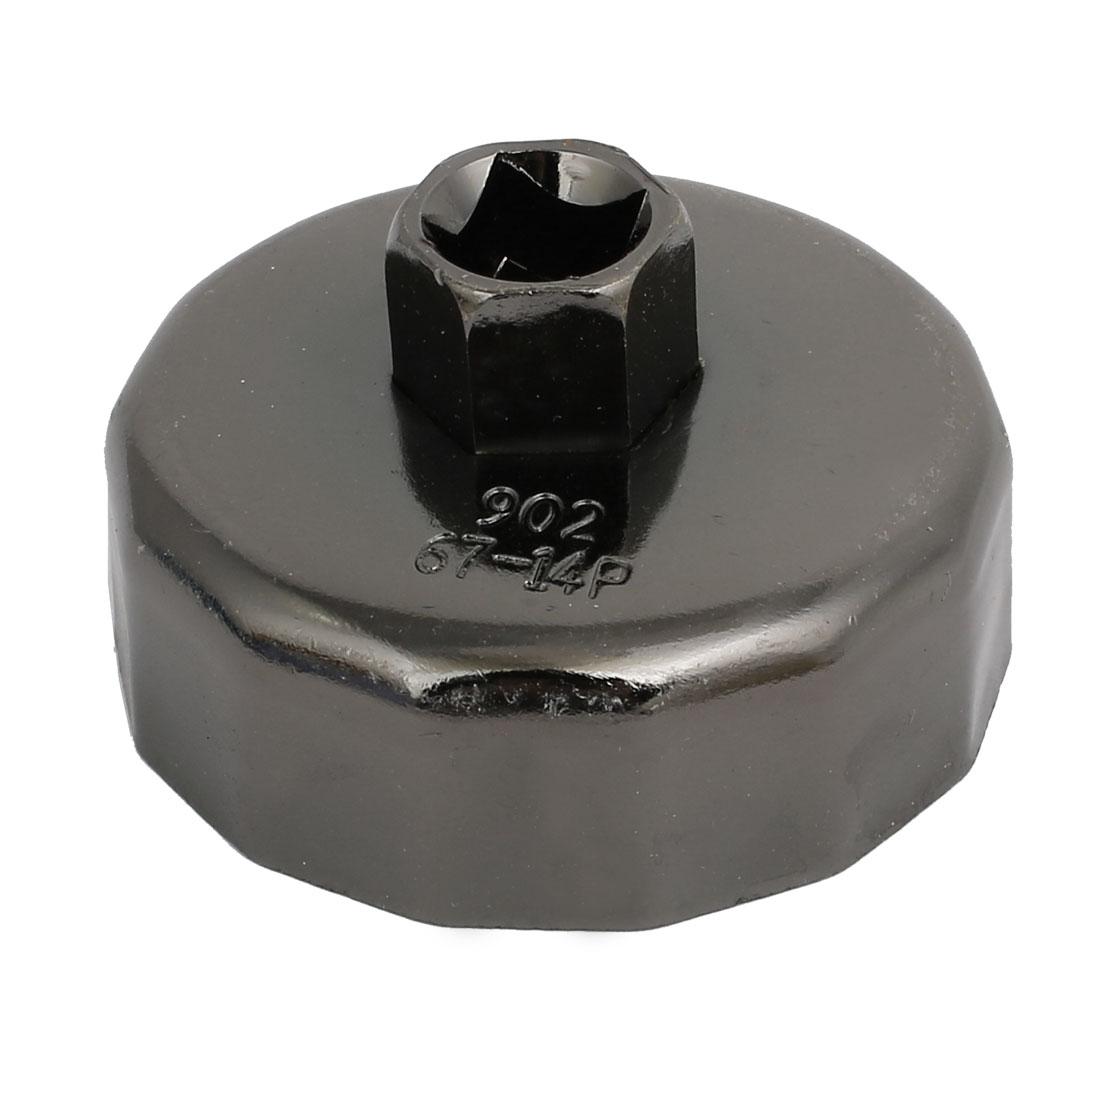 902 14 Flutes 67mm Inner Dia Cap Oil Filter Wrench Spanner Remover Tool